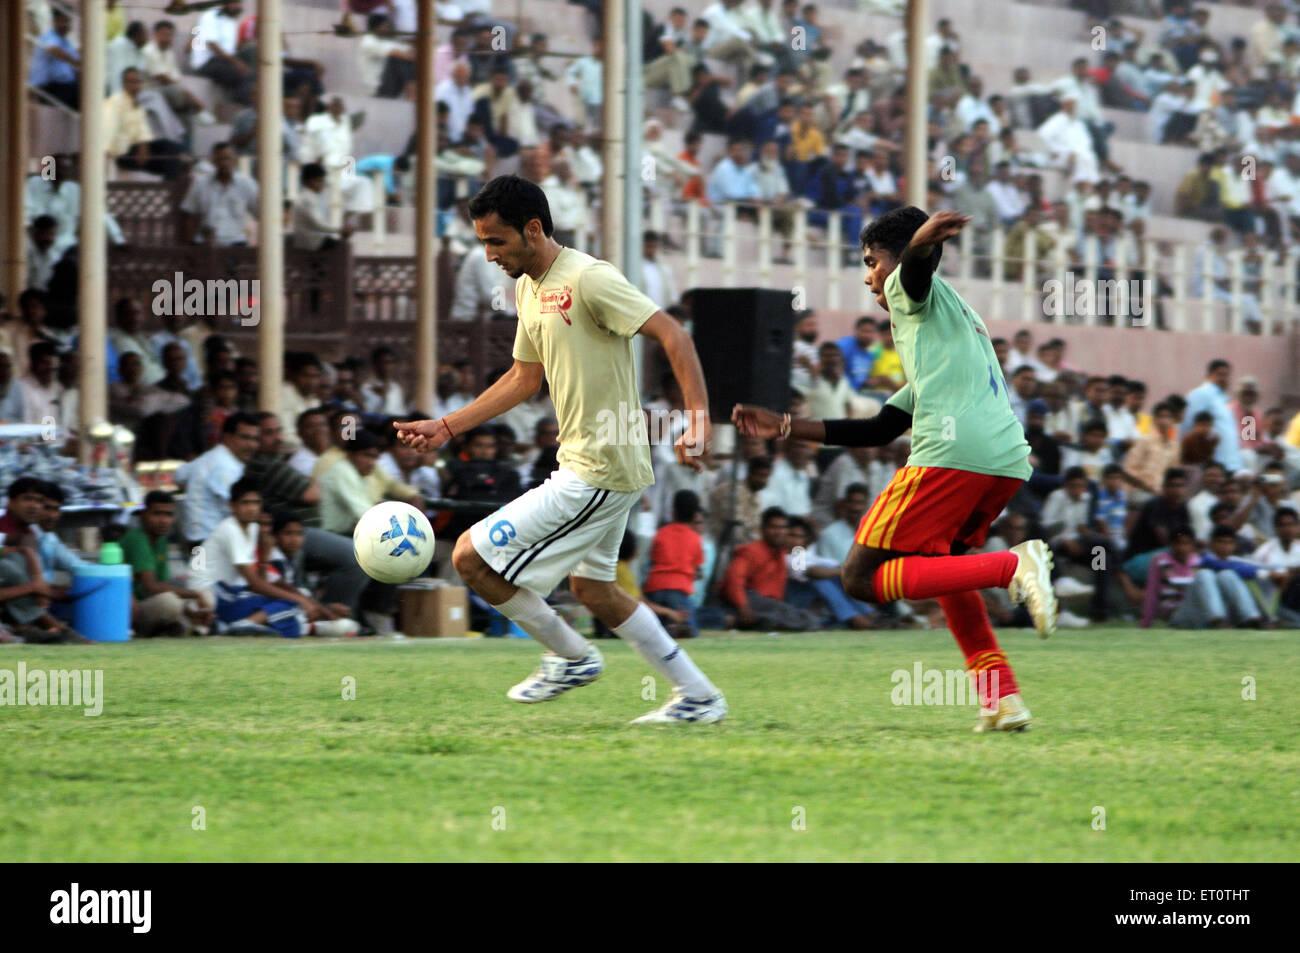 Playing soccer match MR#786 Stock Photo